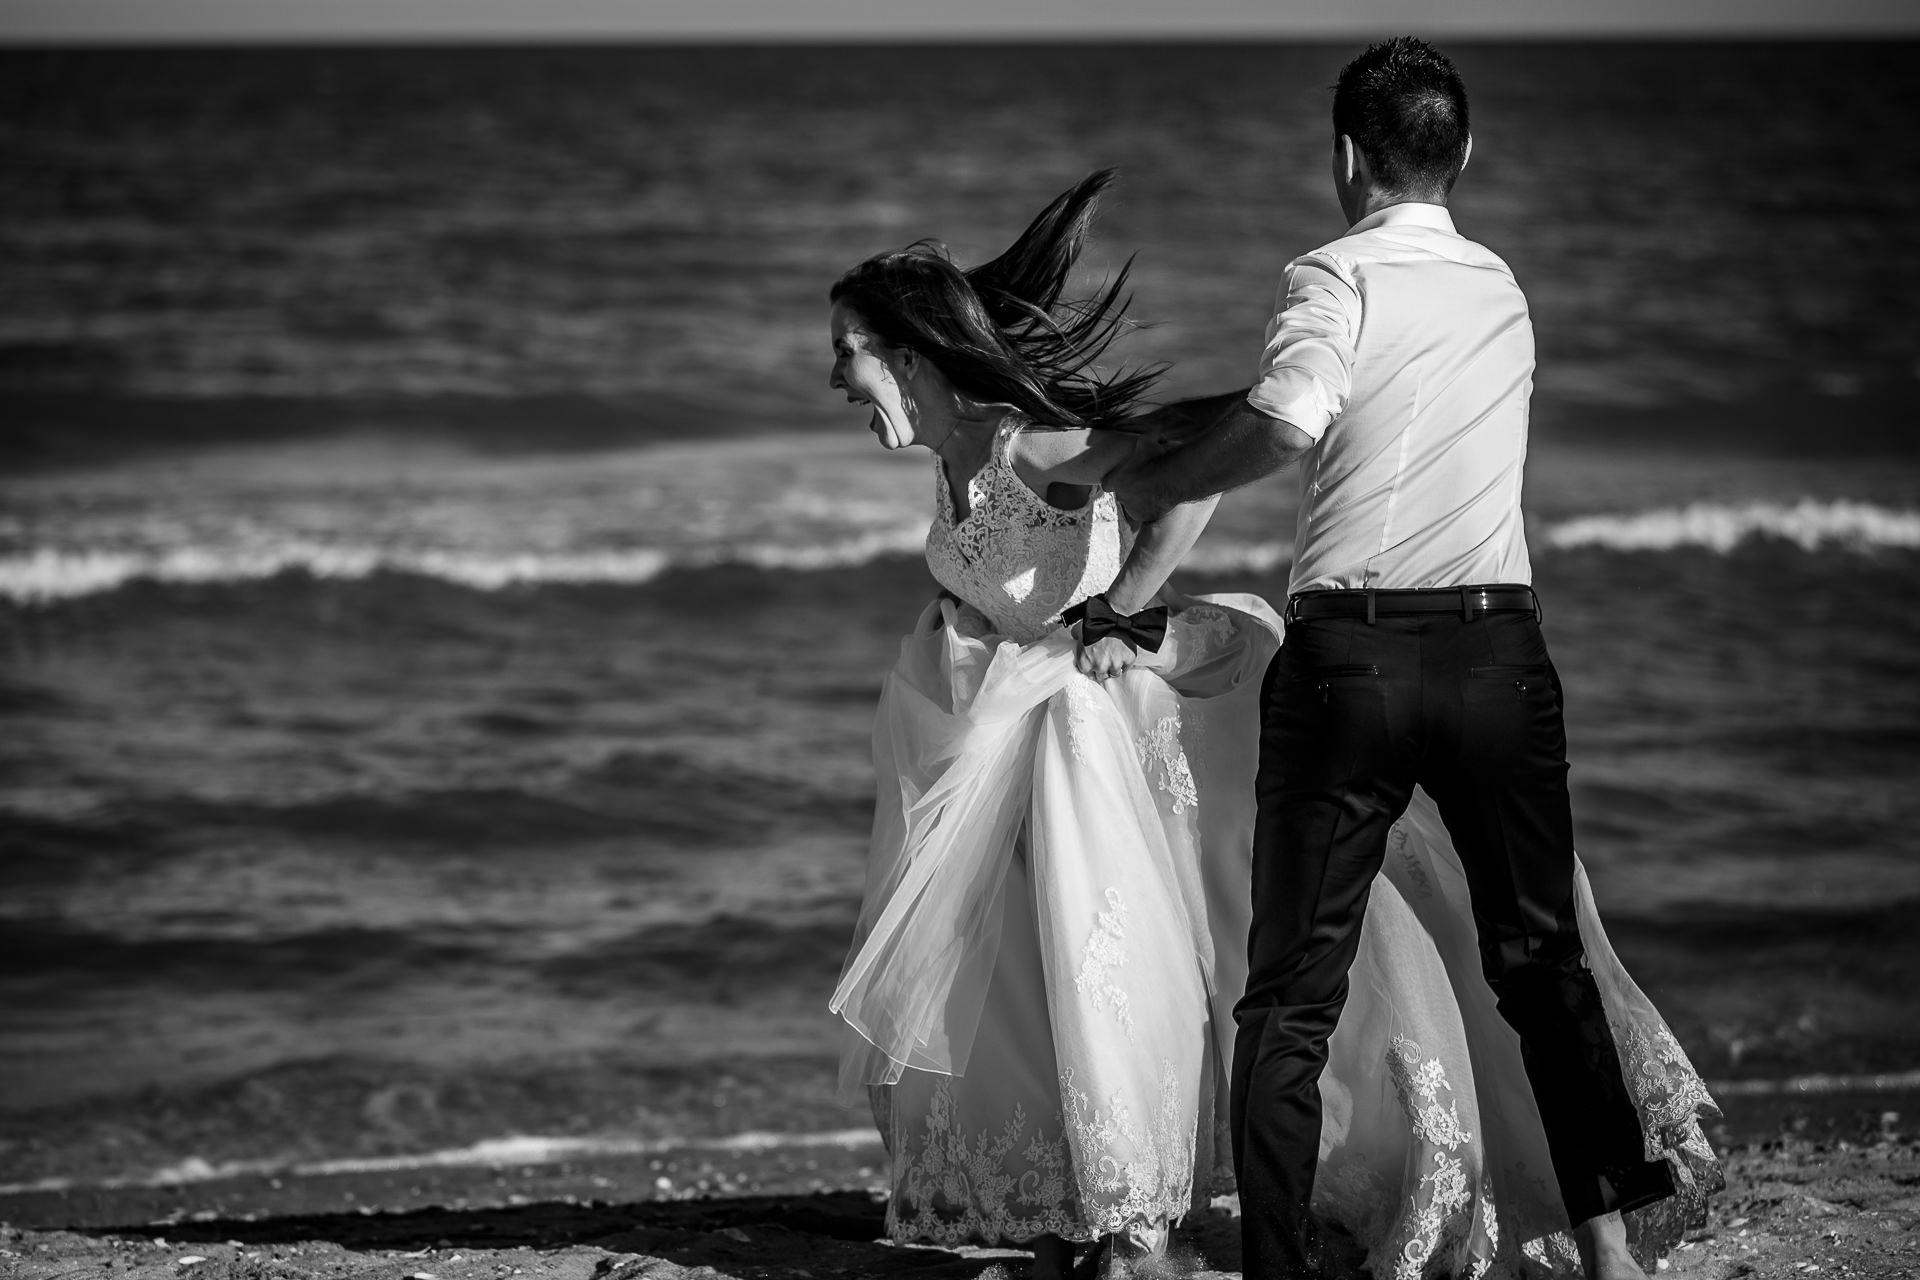 Şedinţă foto Trash The Dress - Vadu + Midia - Mihaela şi Alexandru - Mihai Zaharia Photography - 06